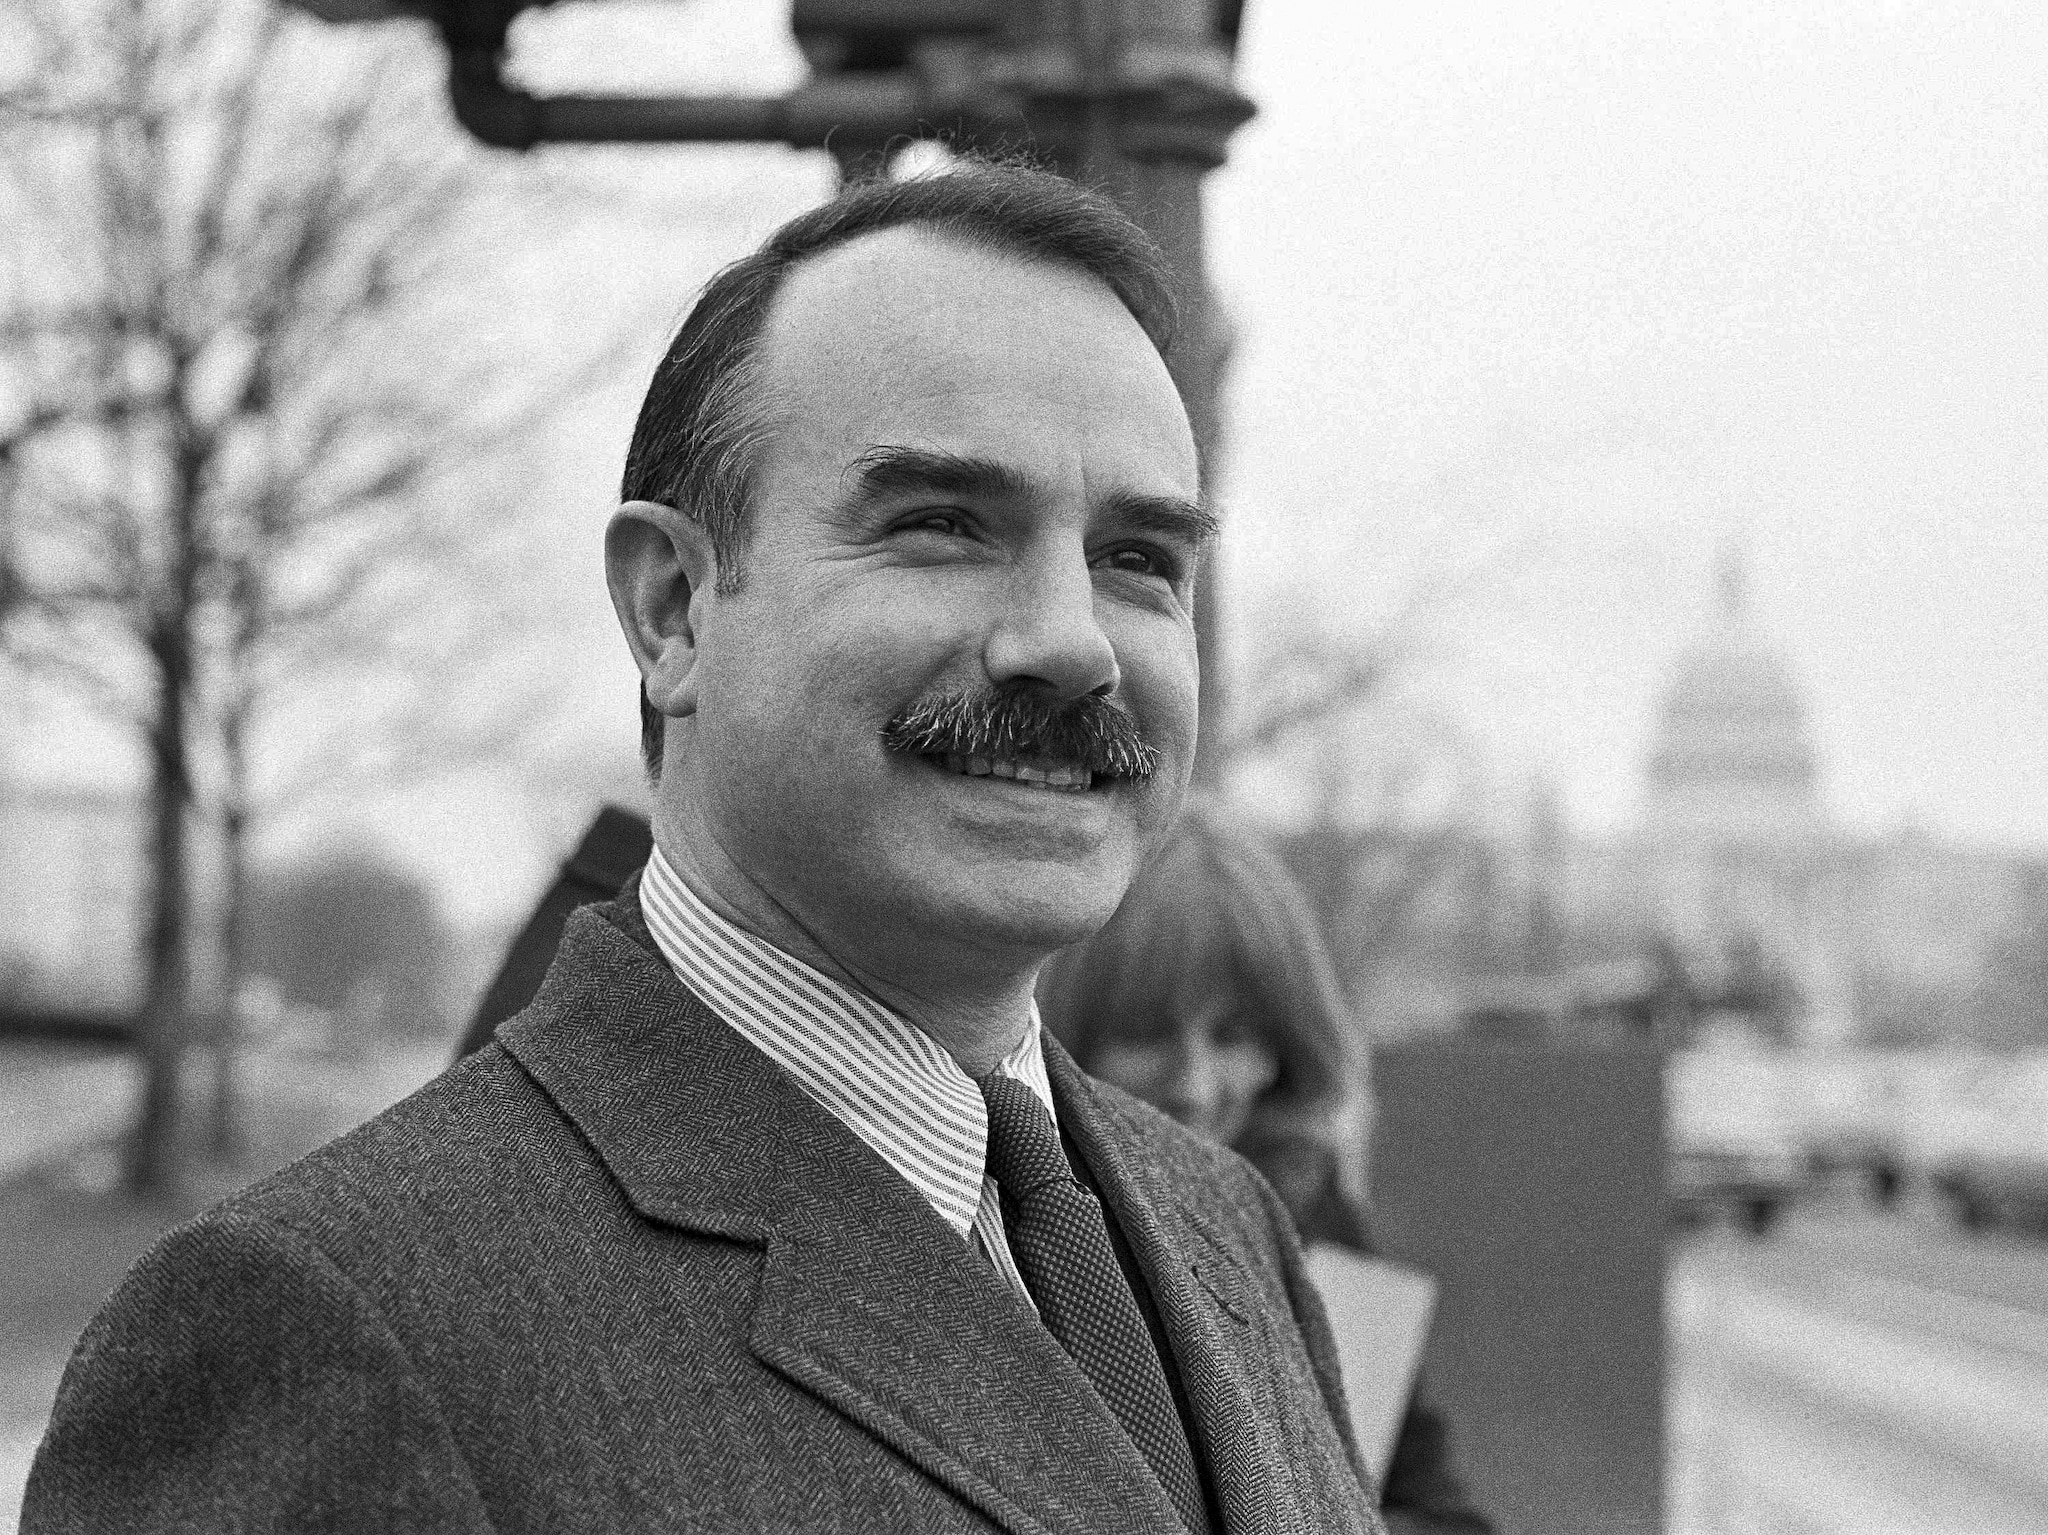 G. Gordon Liddy. (AP Photo/William A. Smith, File)